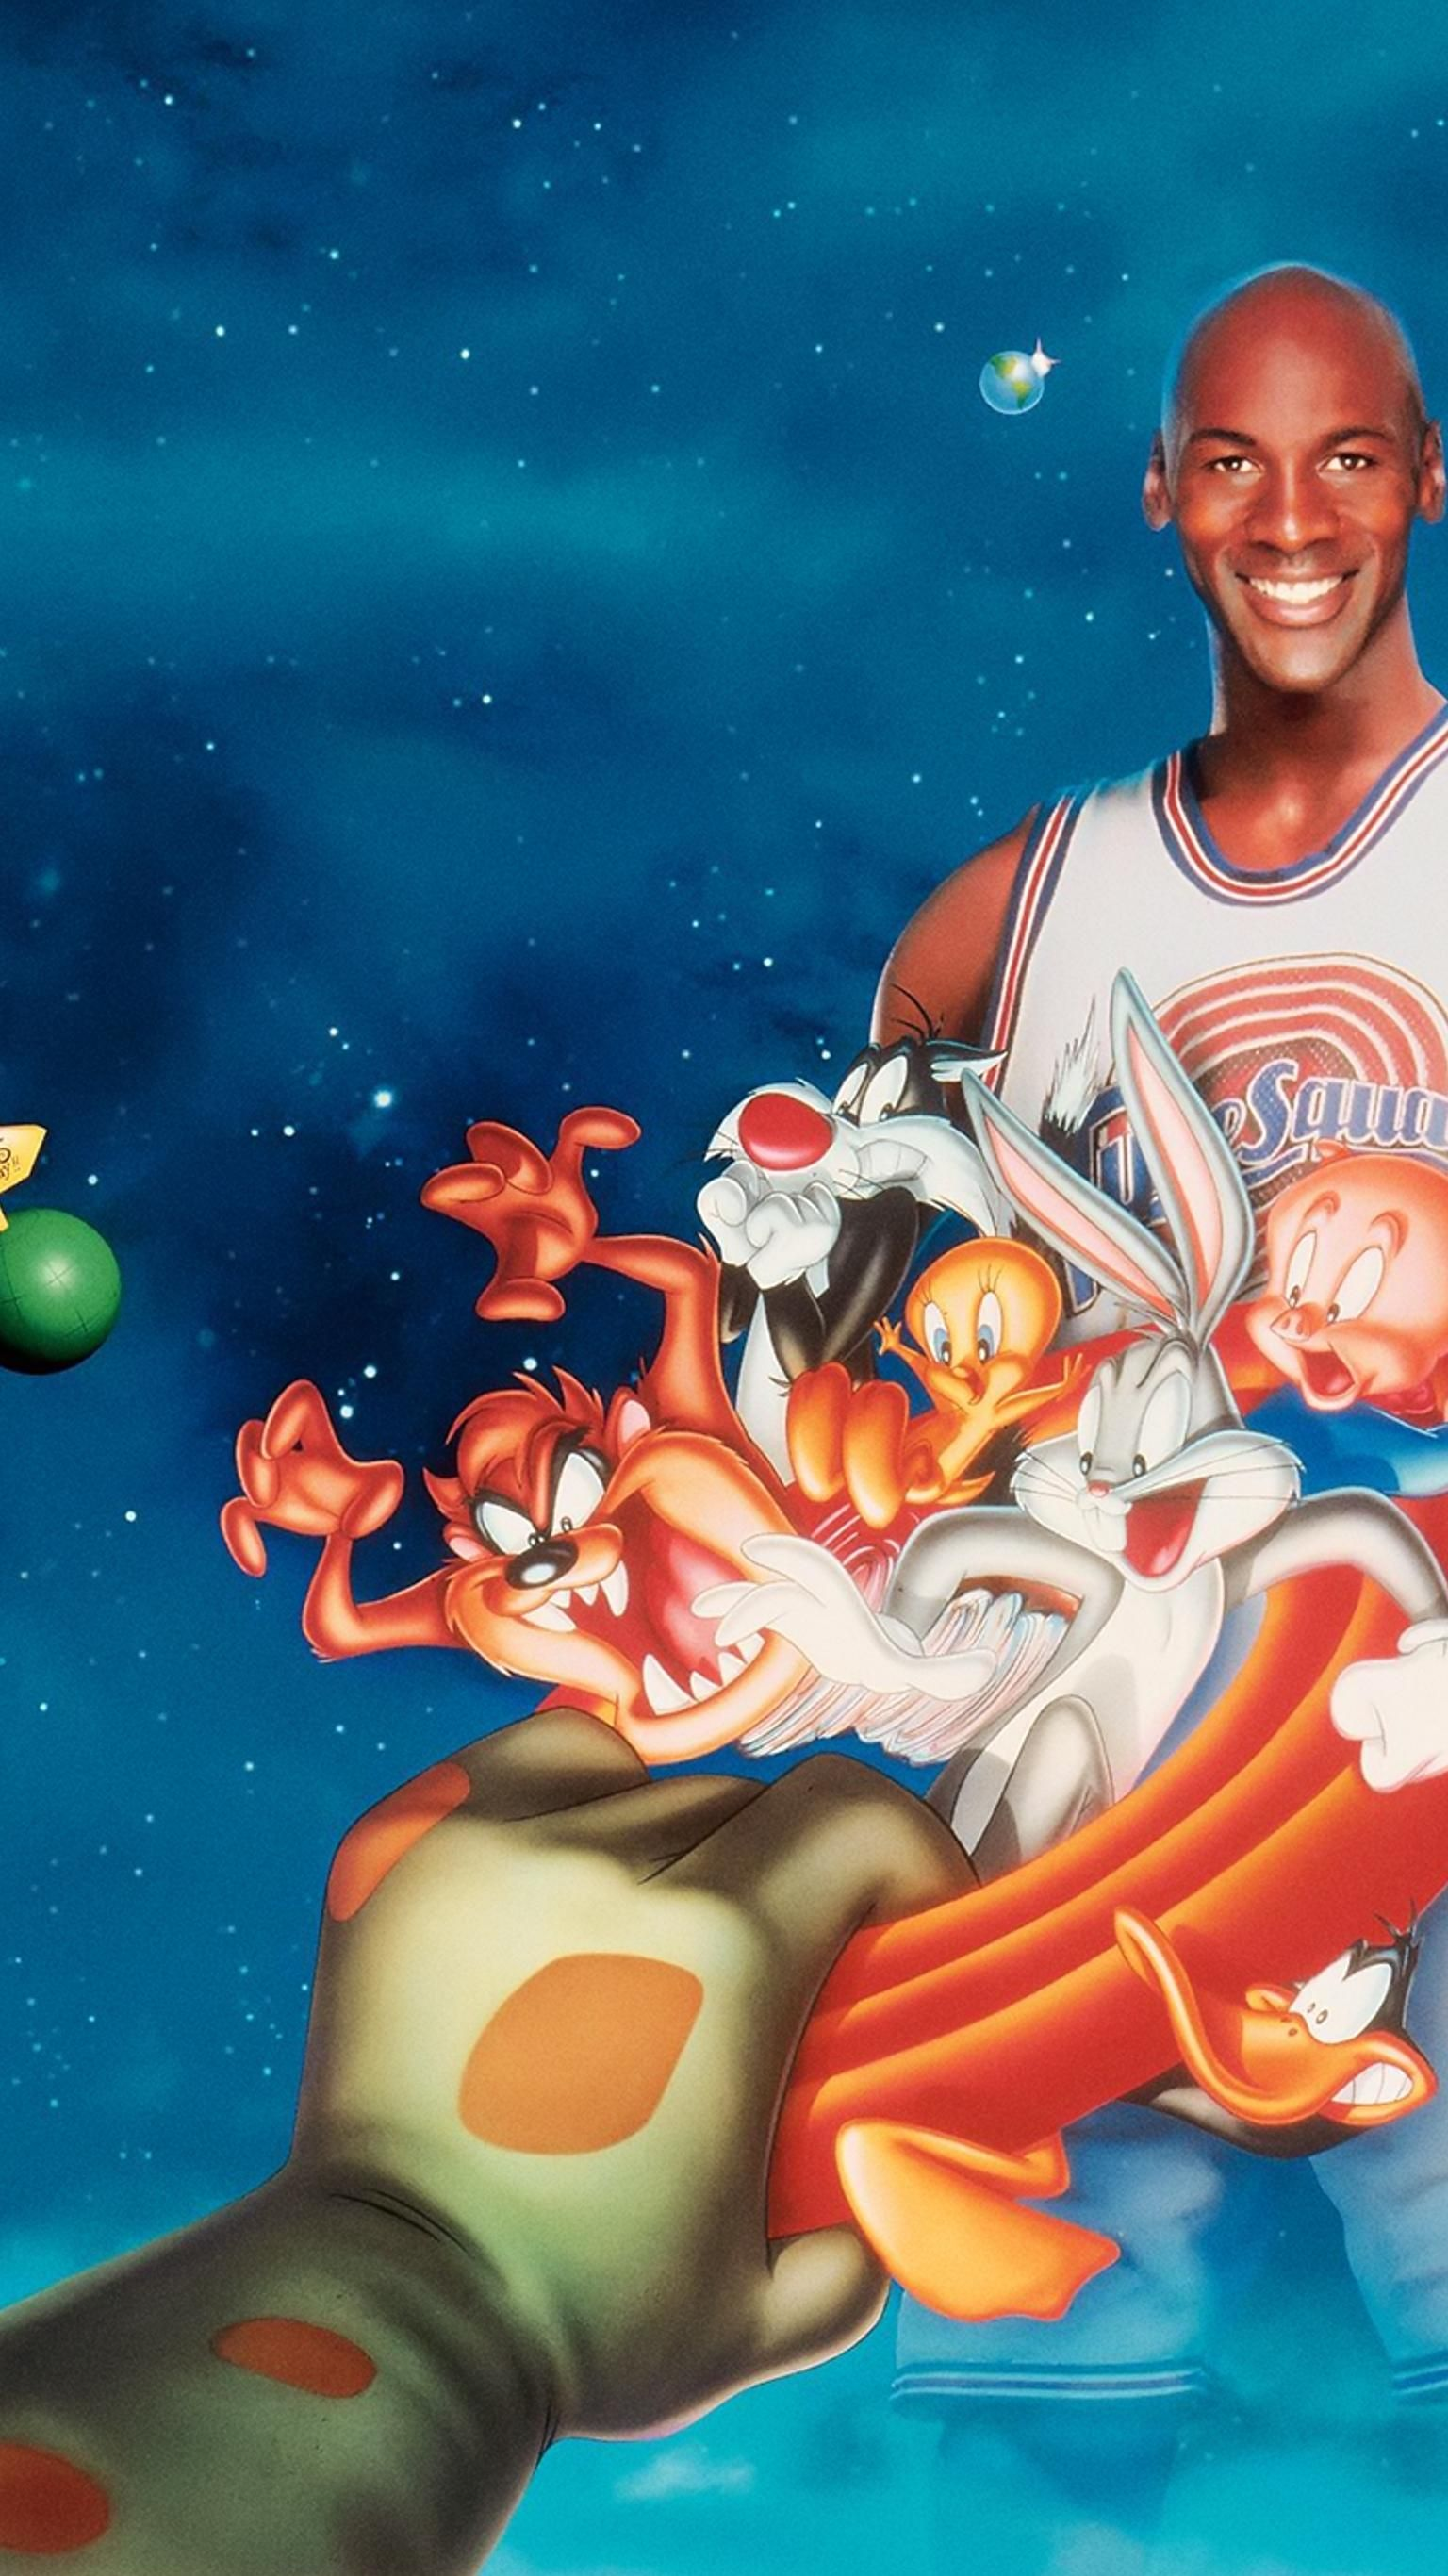 Space Jam Bugs Bunny Wallpaper Iphone 1536x2732